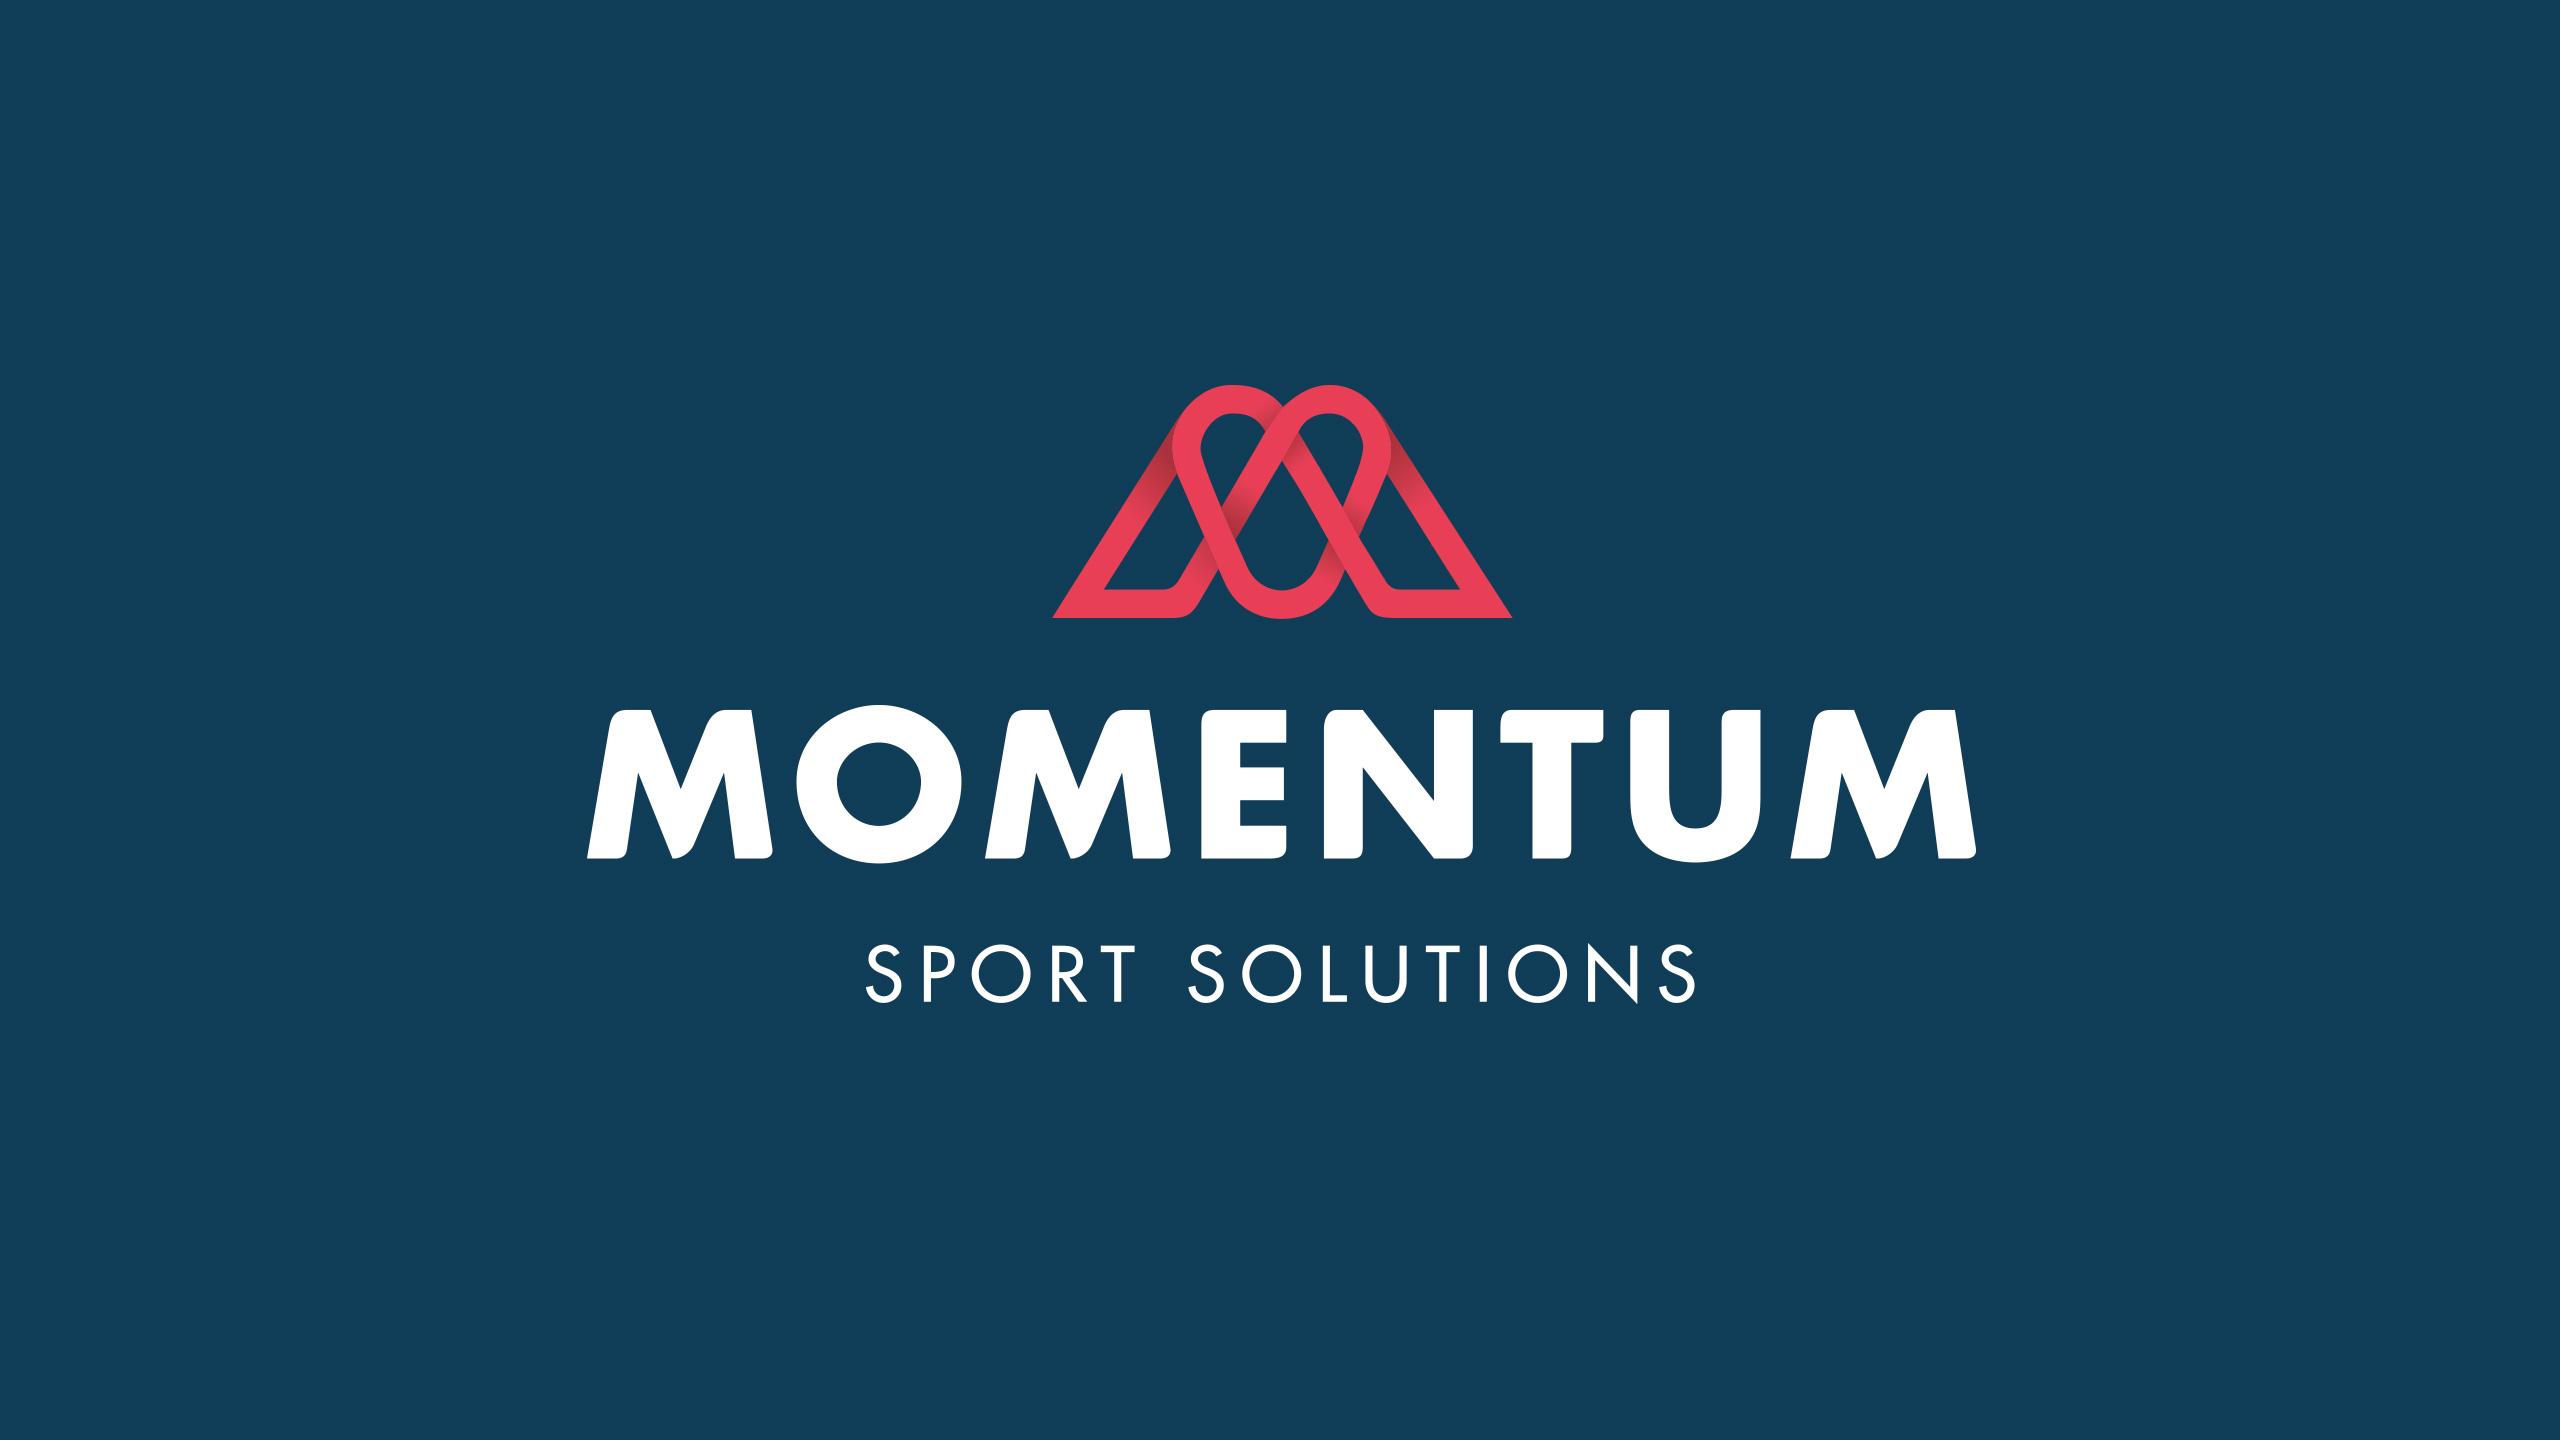 kamikaze_momentum_identidad_06